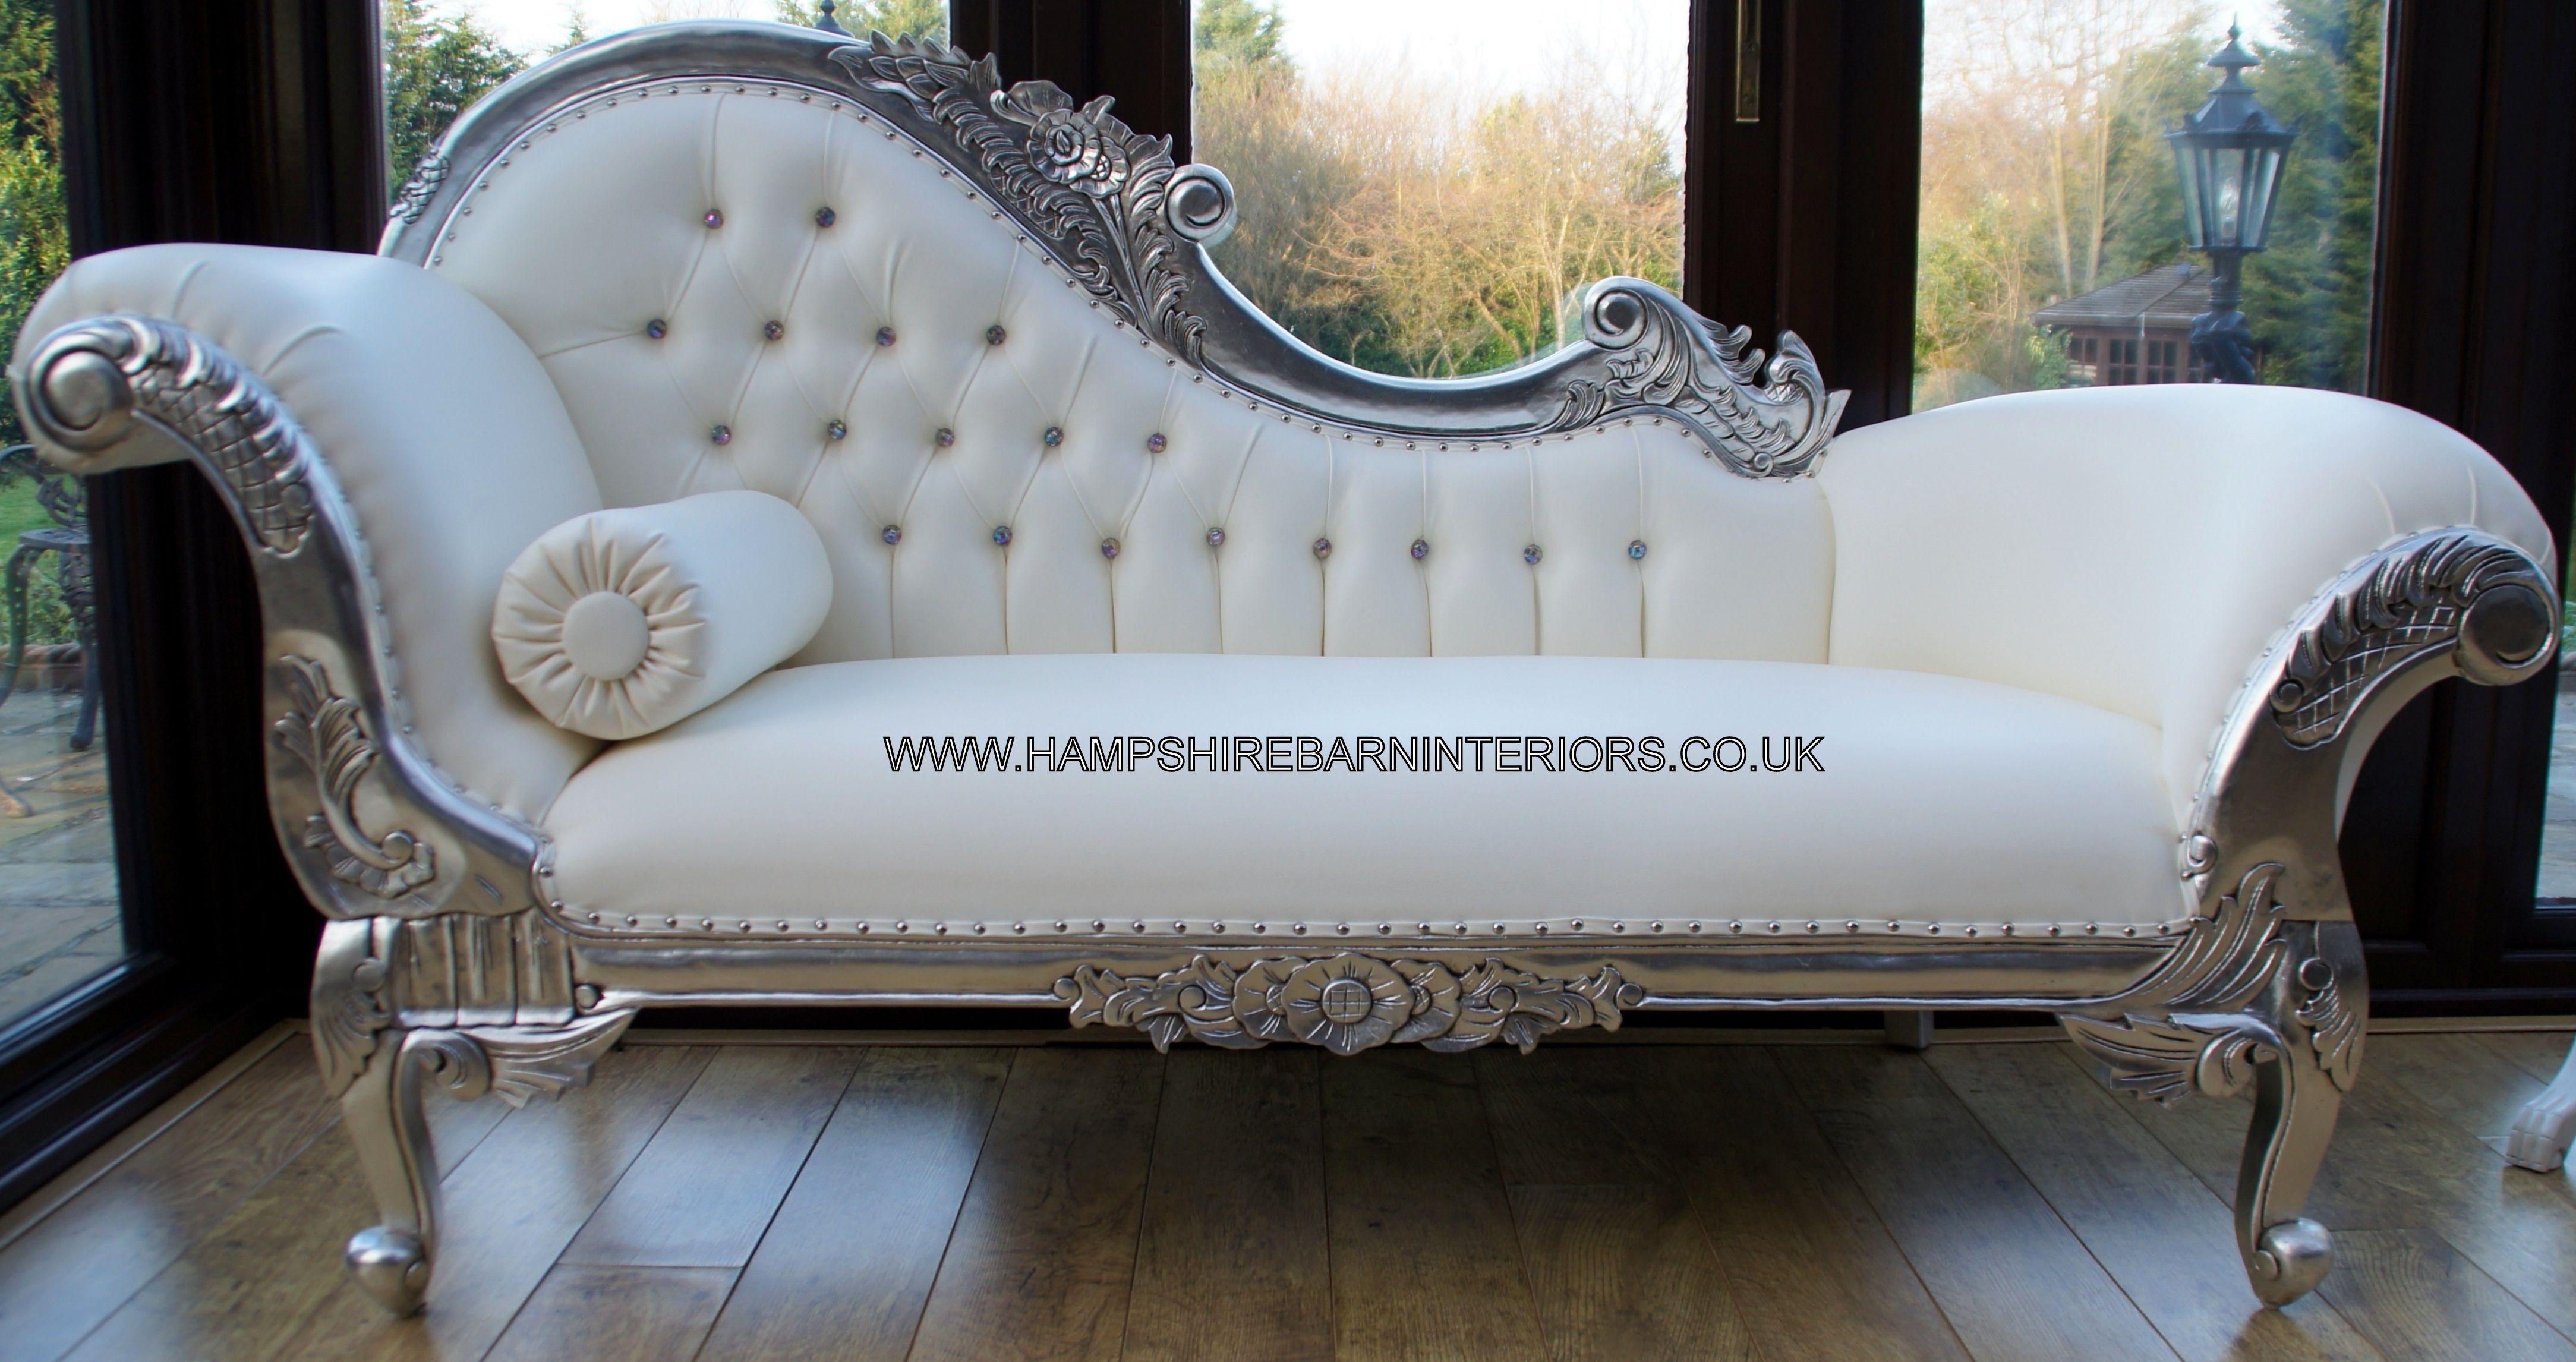 White Leather Chaise Lounge Дизайн мебели, Дизайн